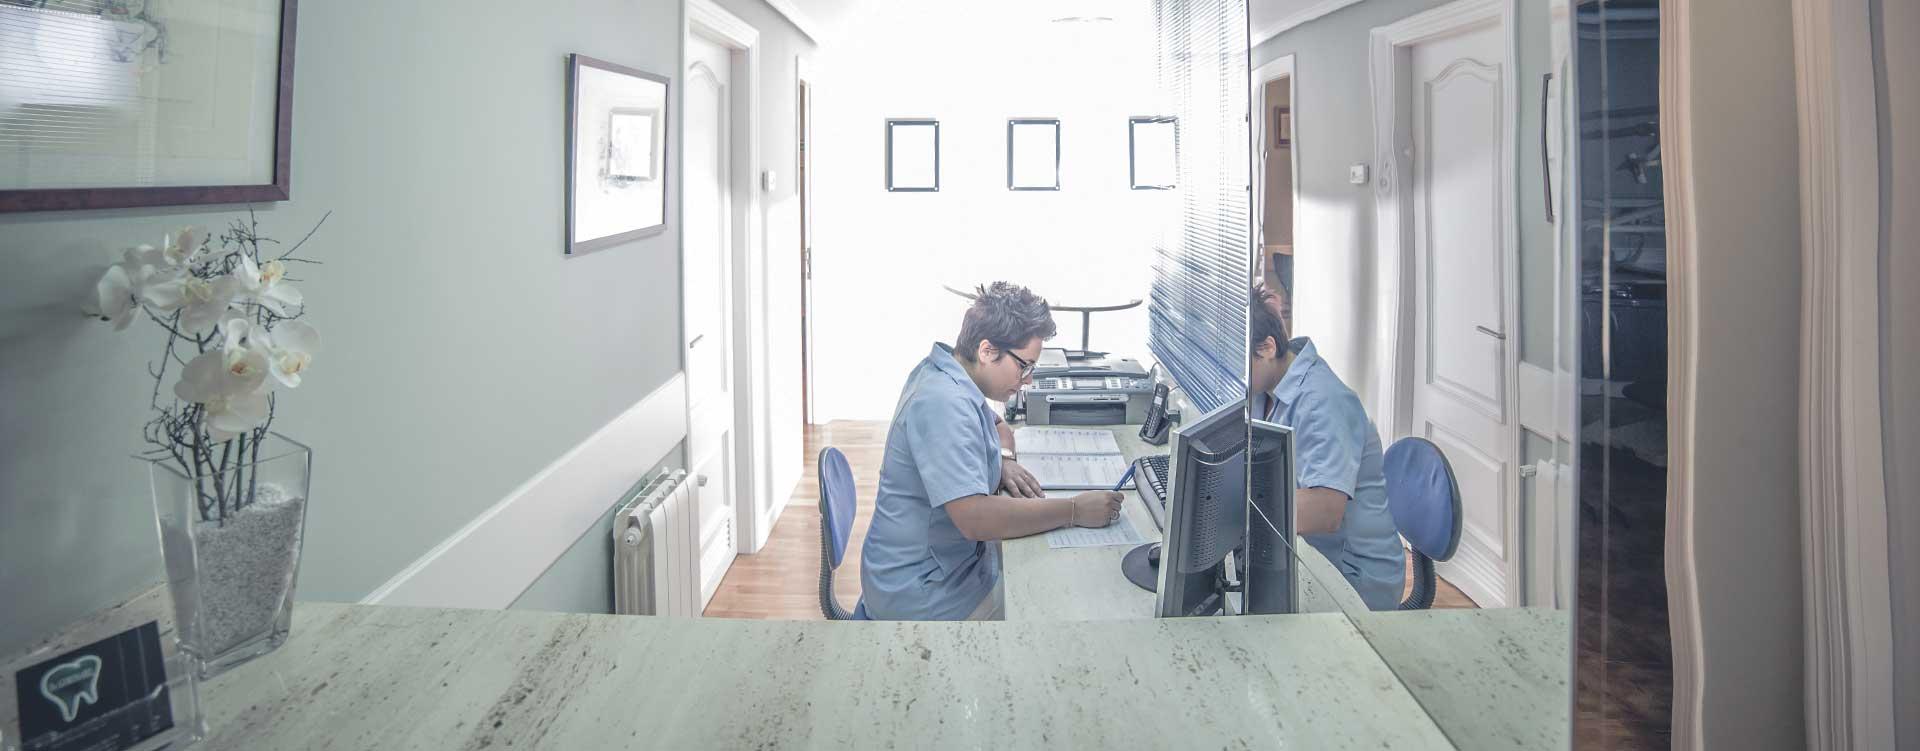 clinica-gorosabel-dental-instalaciones-4